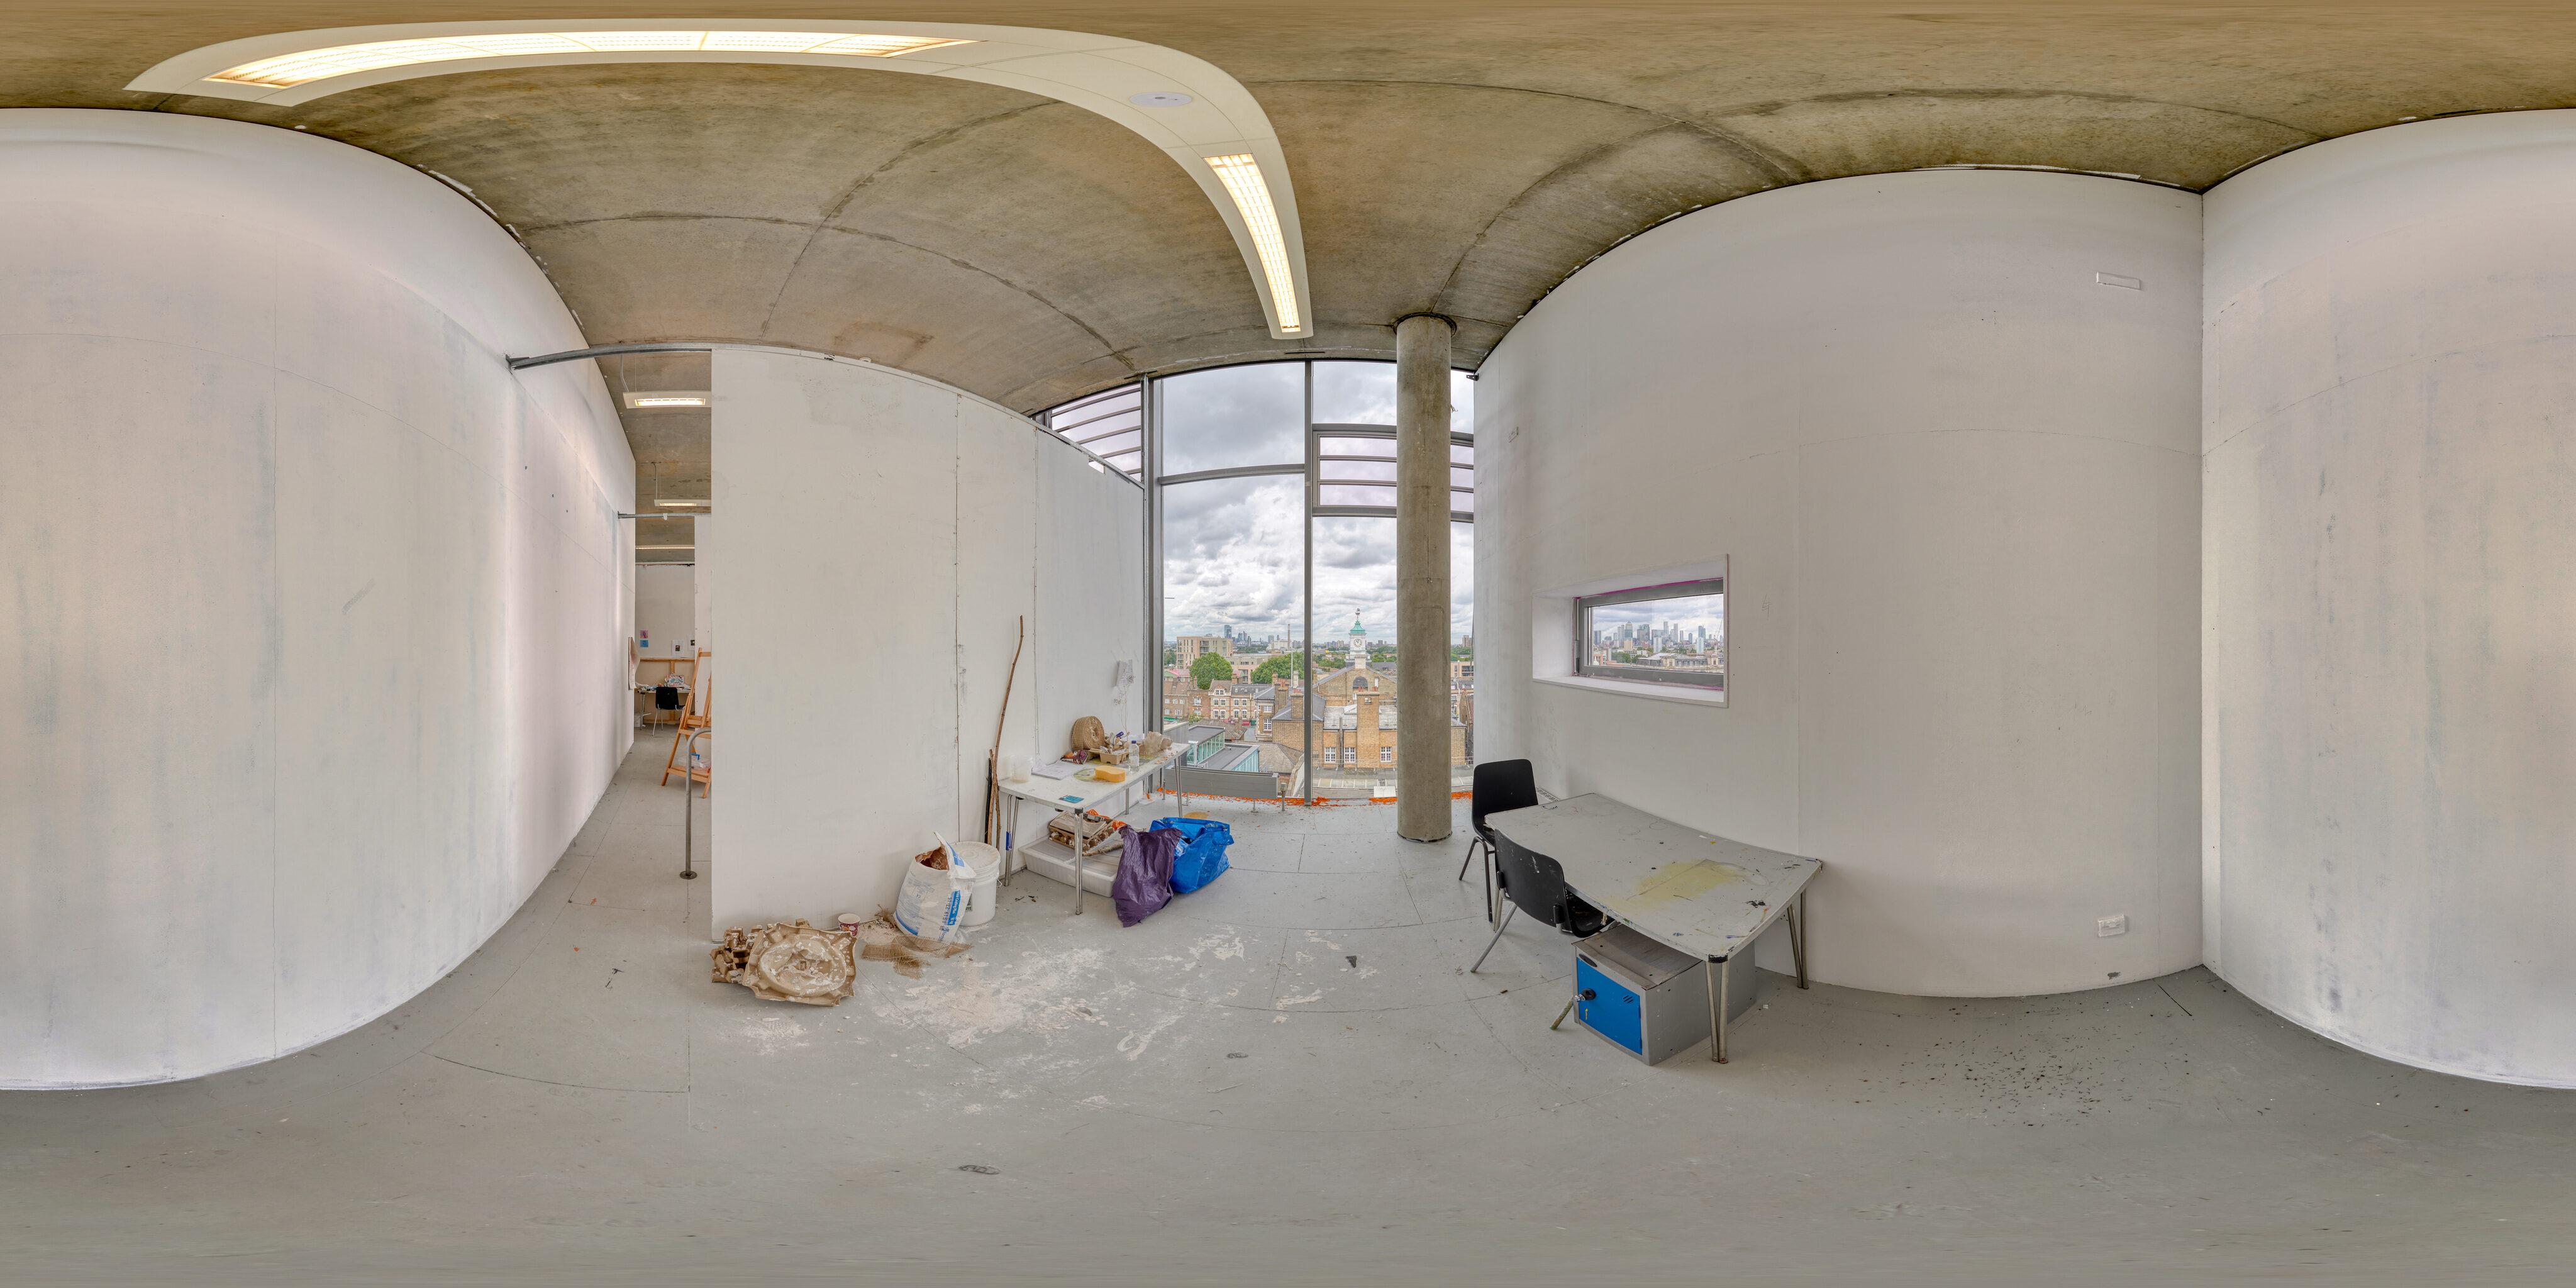 360 of Art Studios